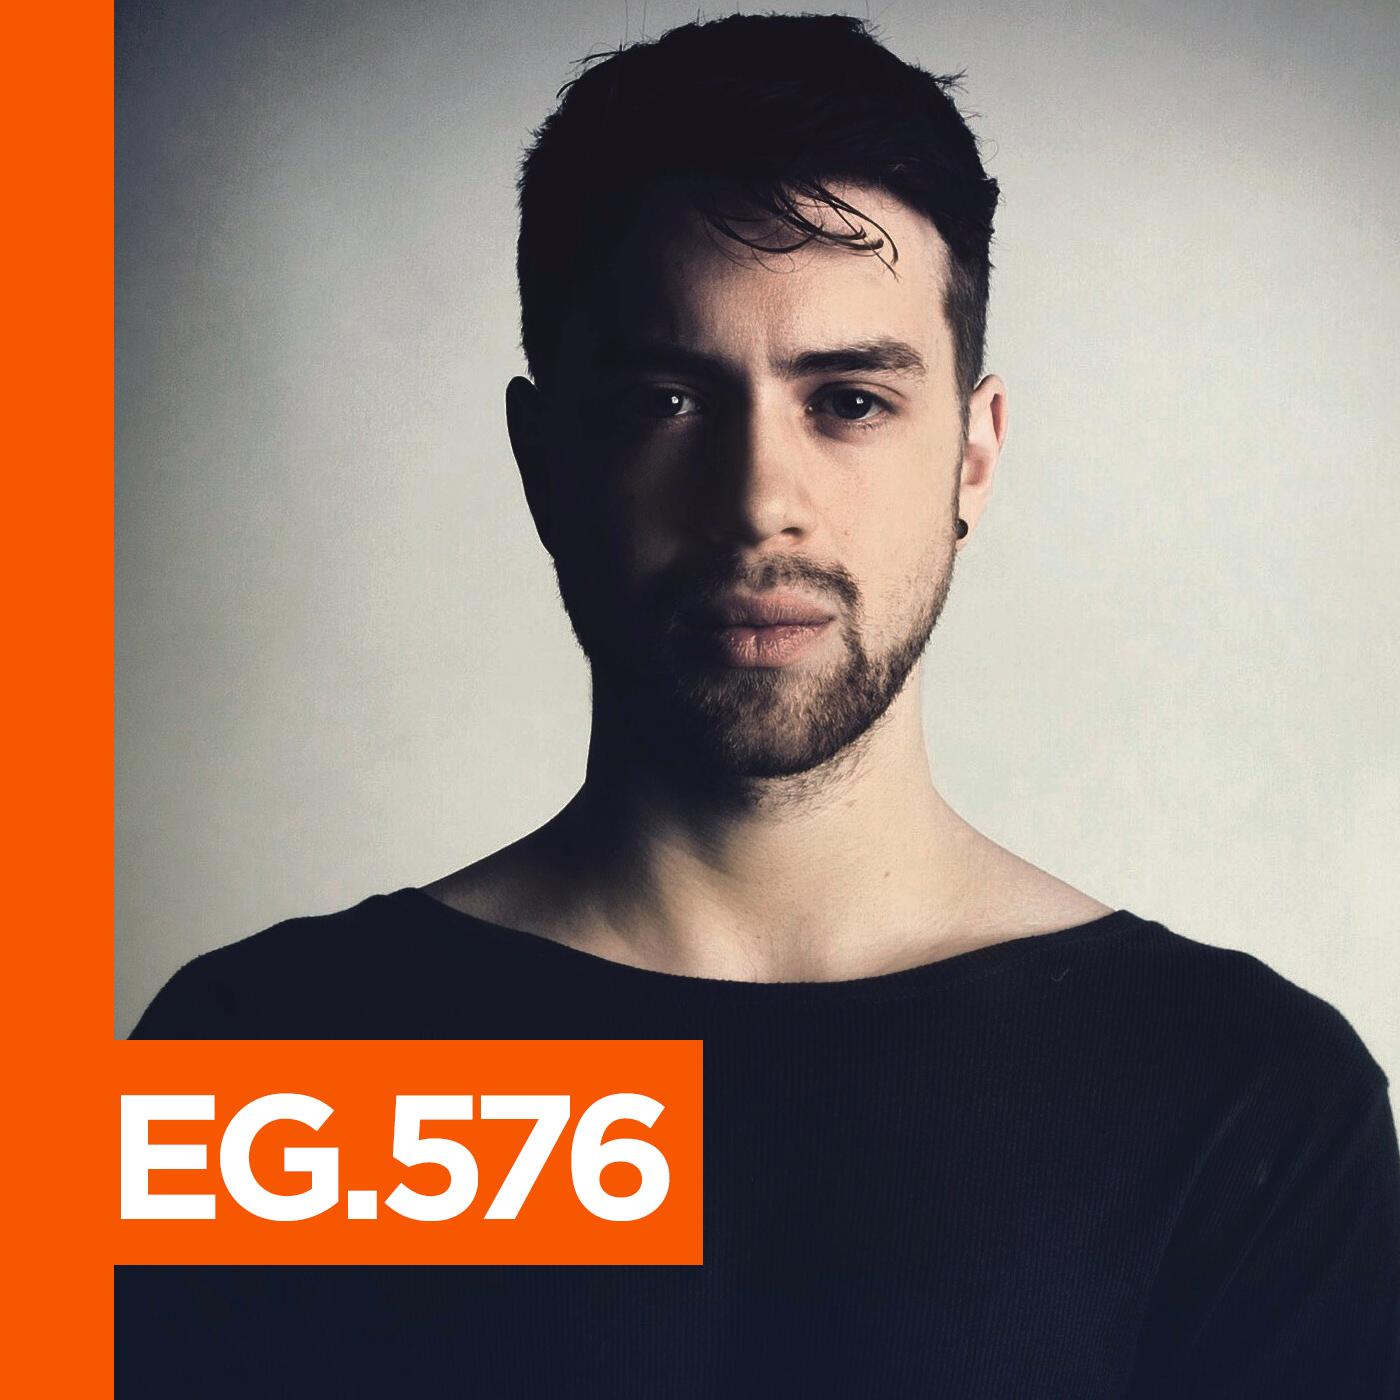 EG.576 Third Son